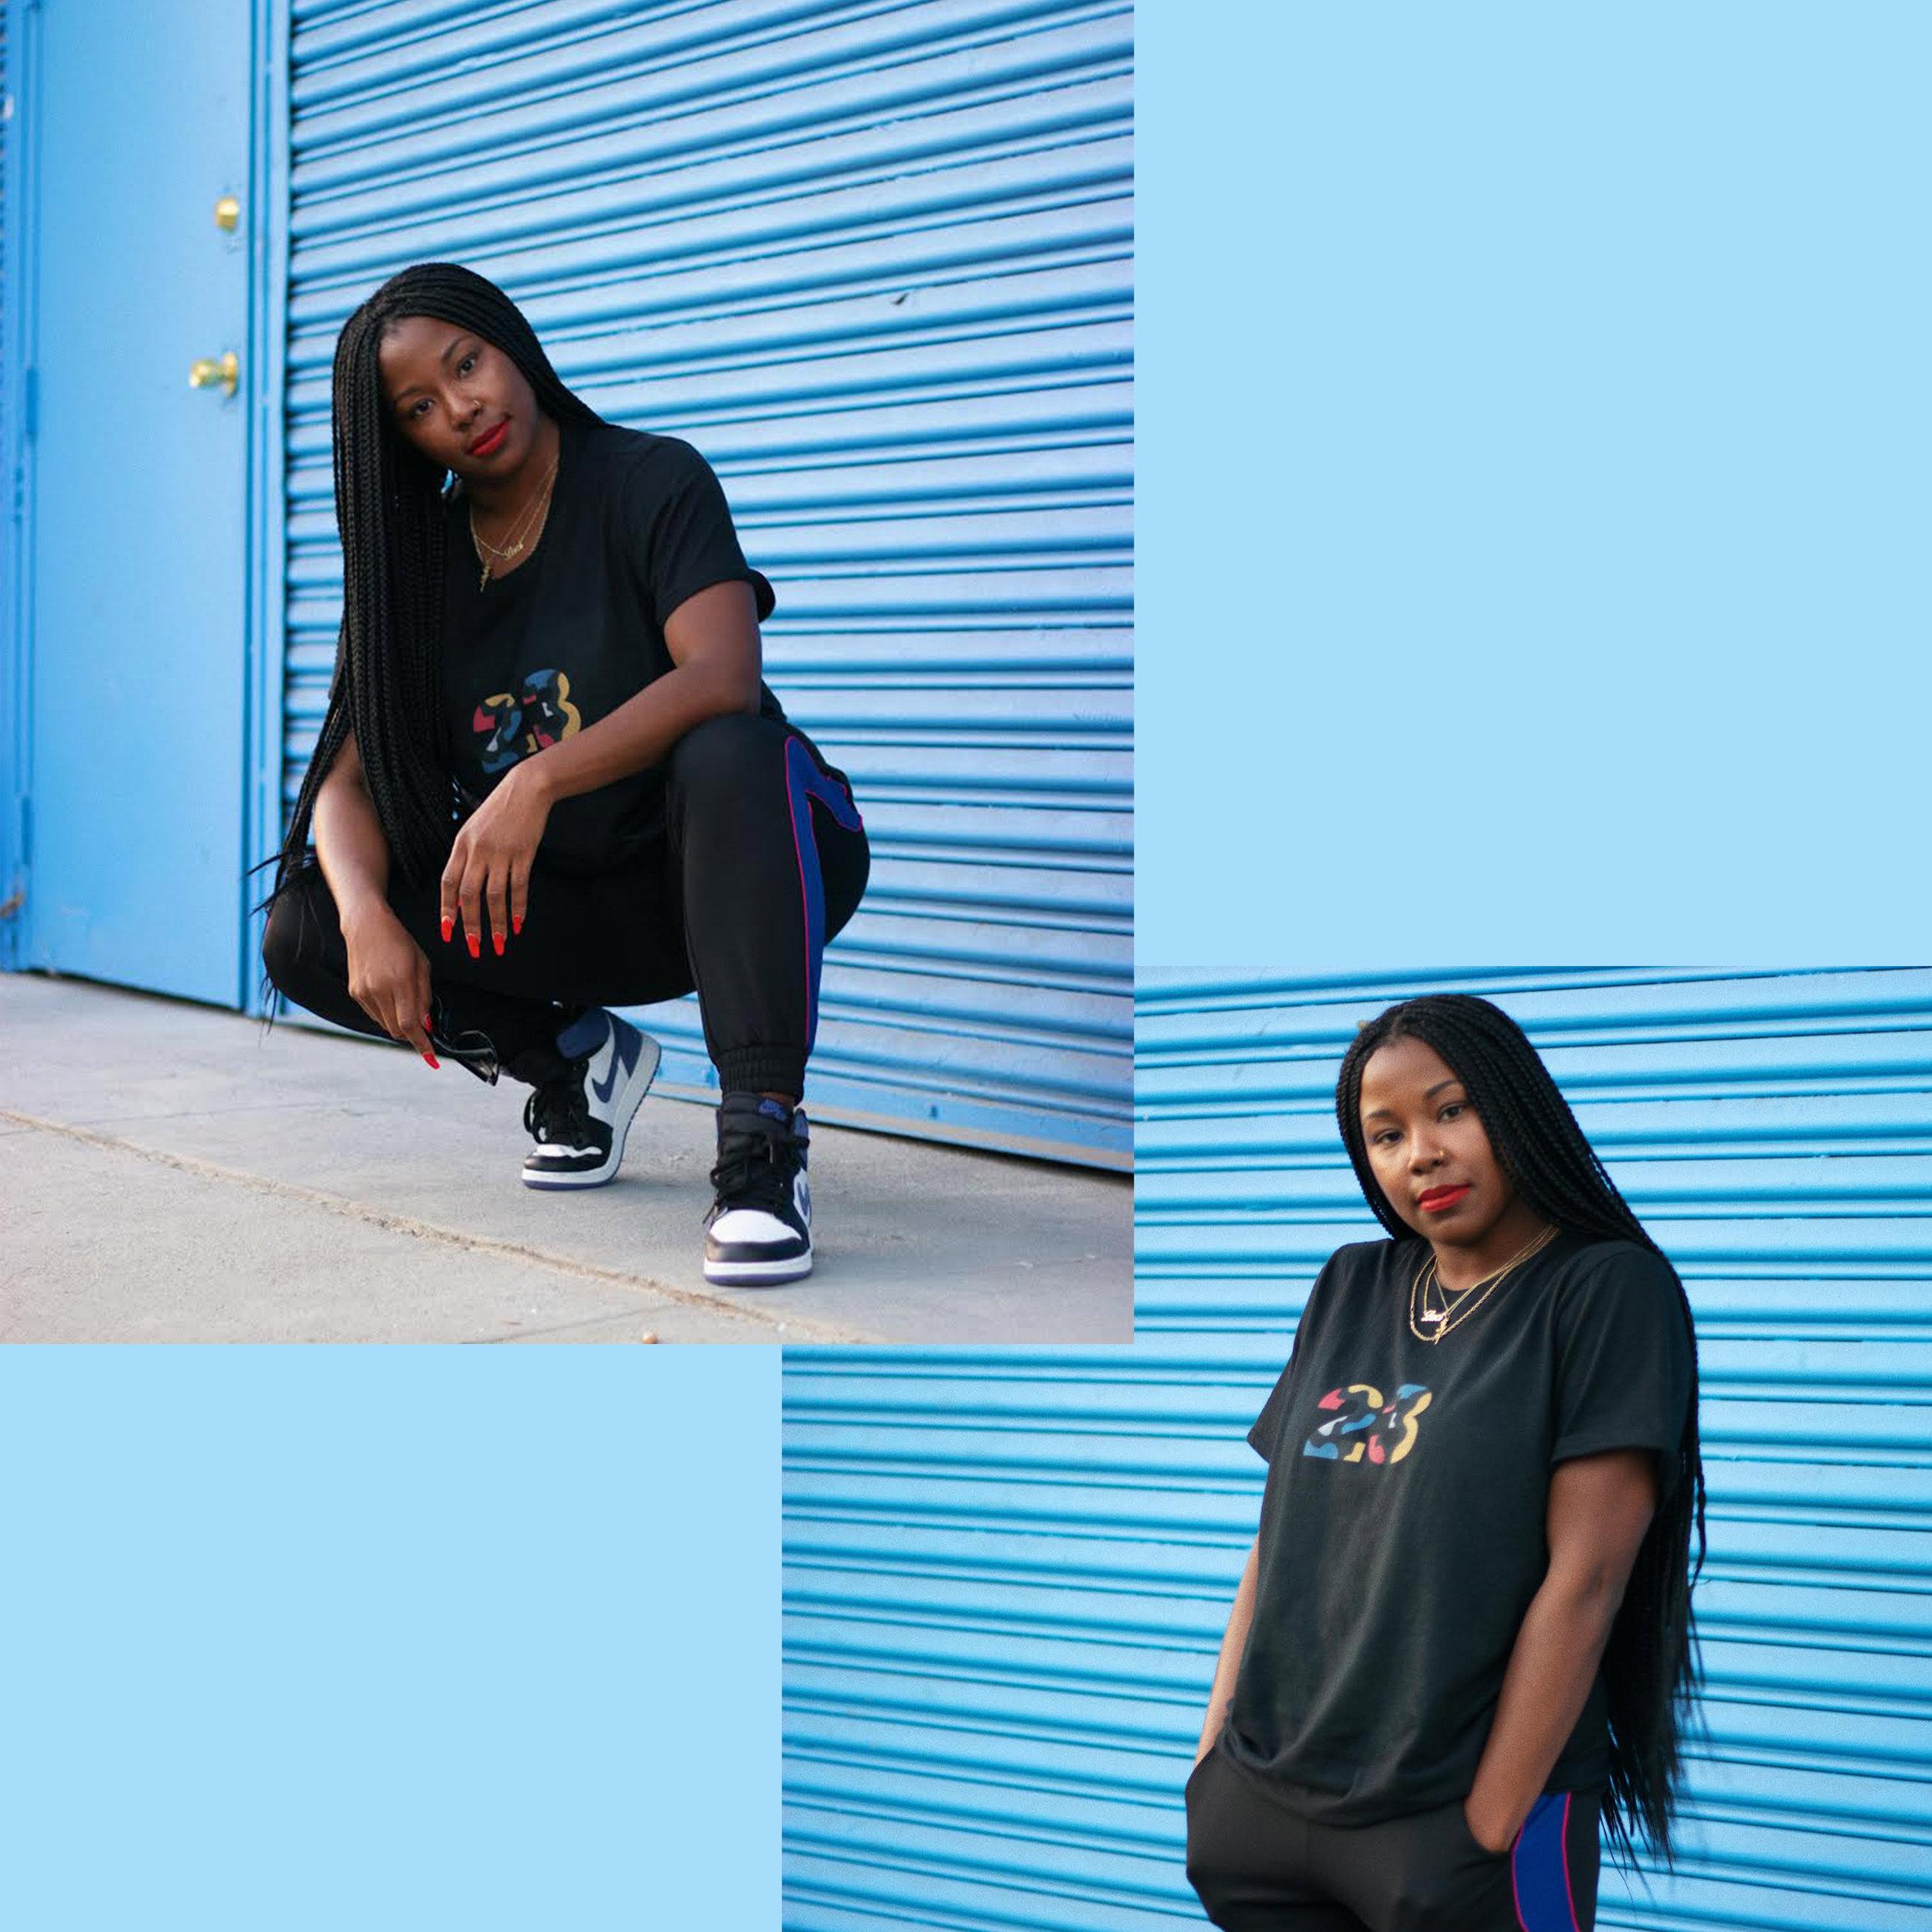 Jordan-Shirt.jpg